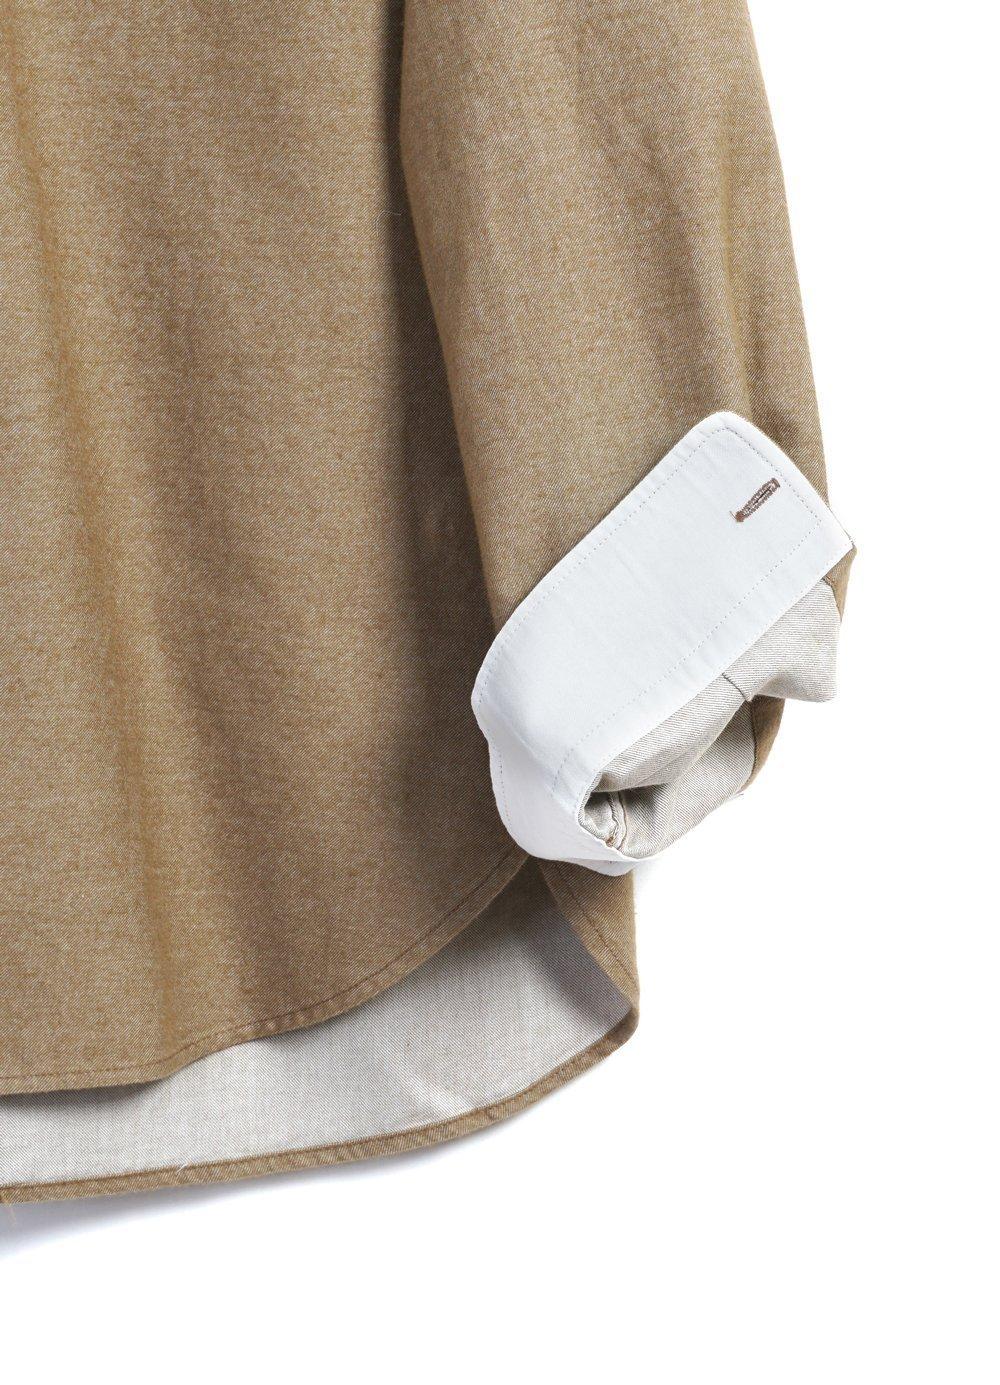 Hansen Garments ANTE   Casual Classic Shirt   white, beige